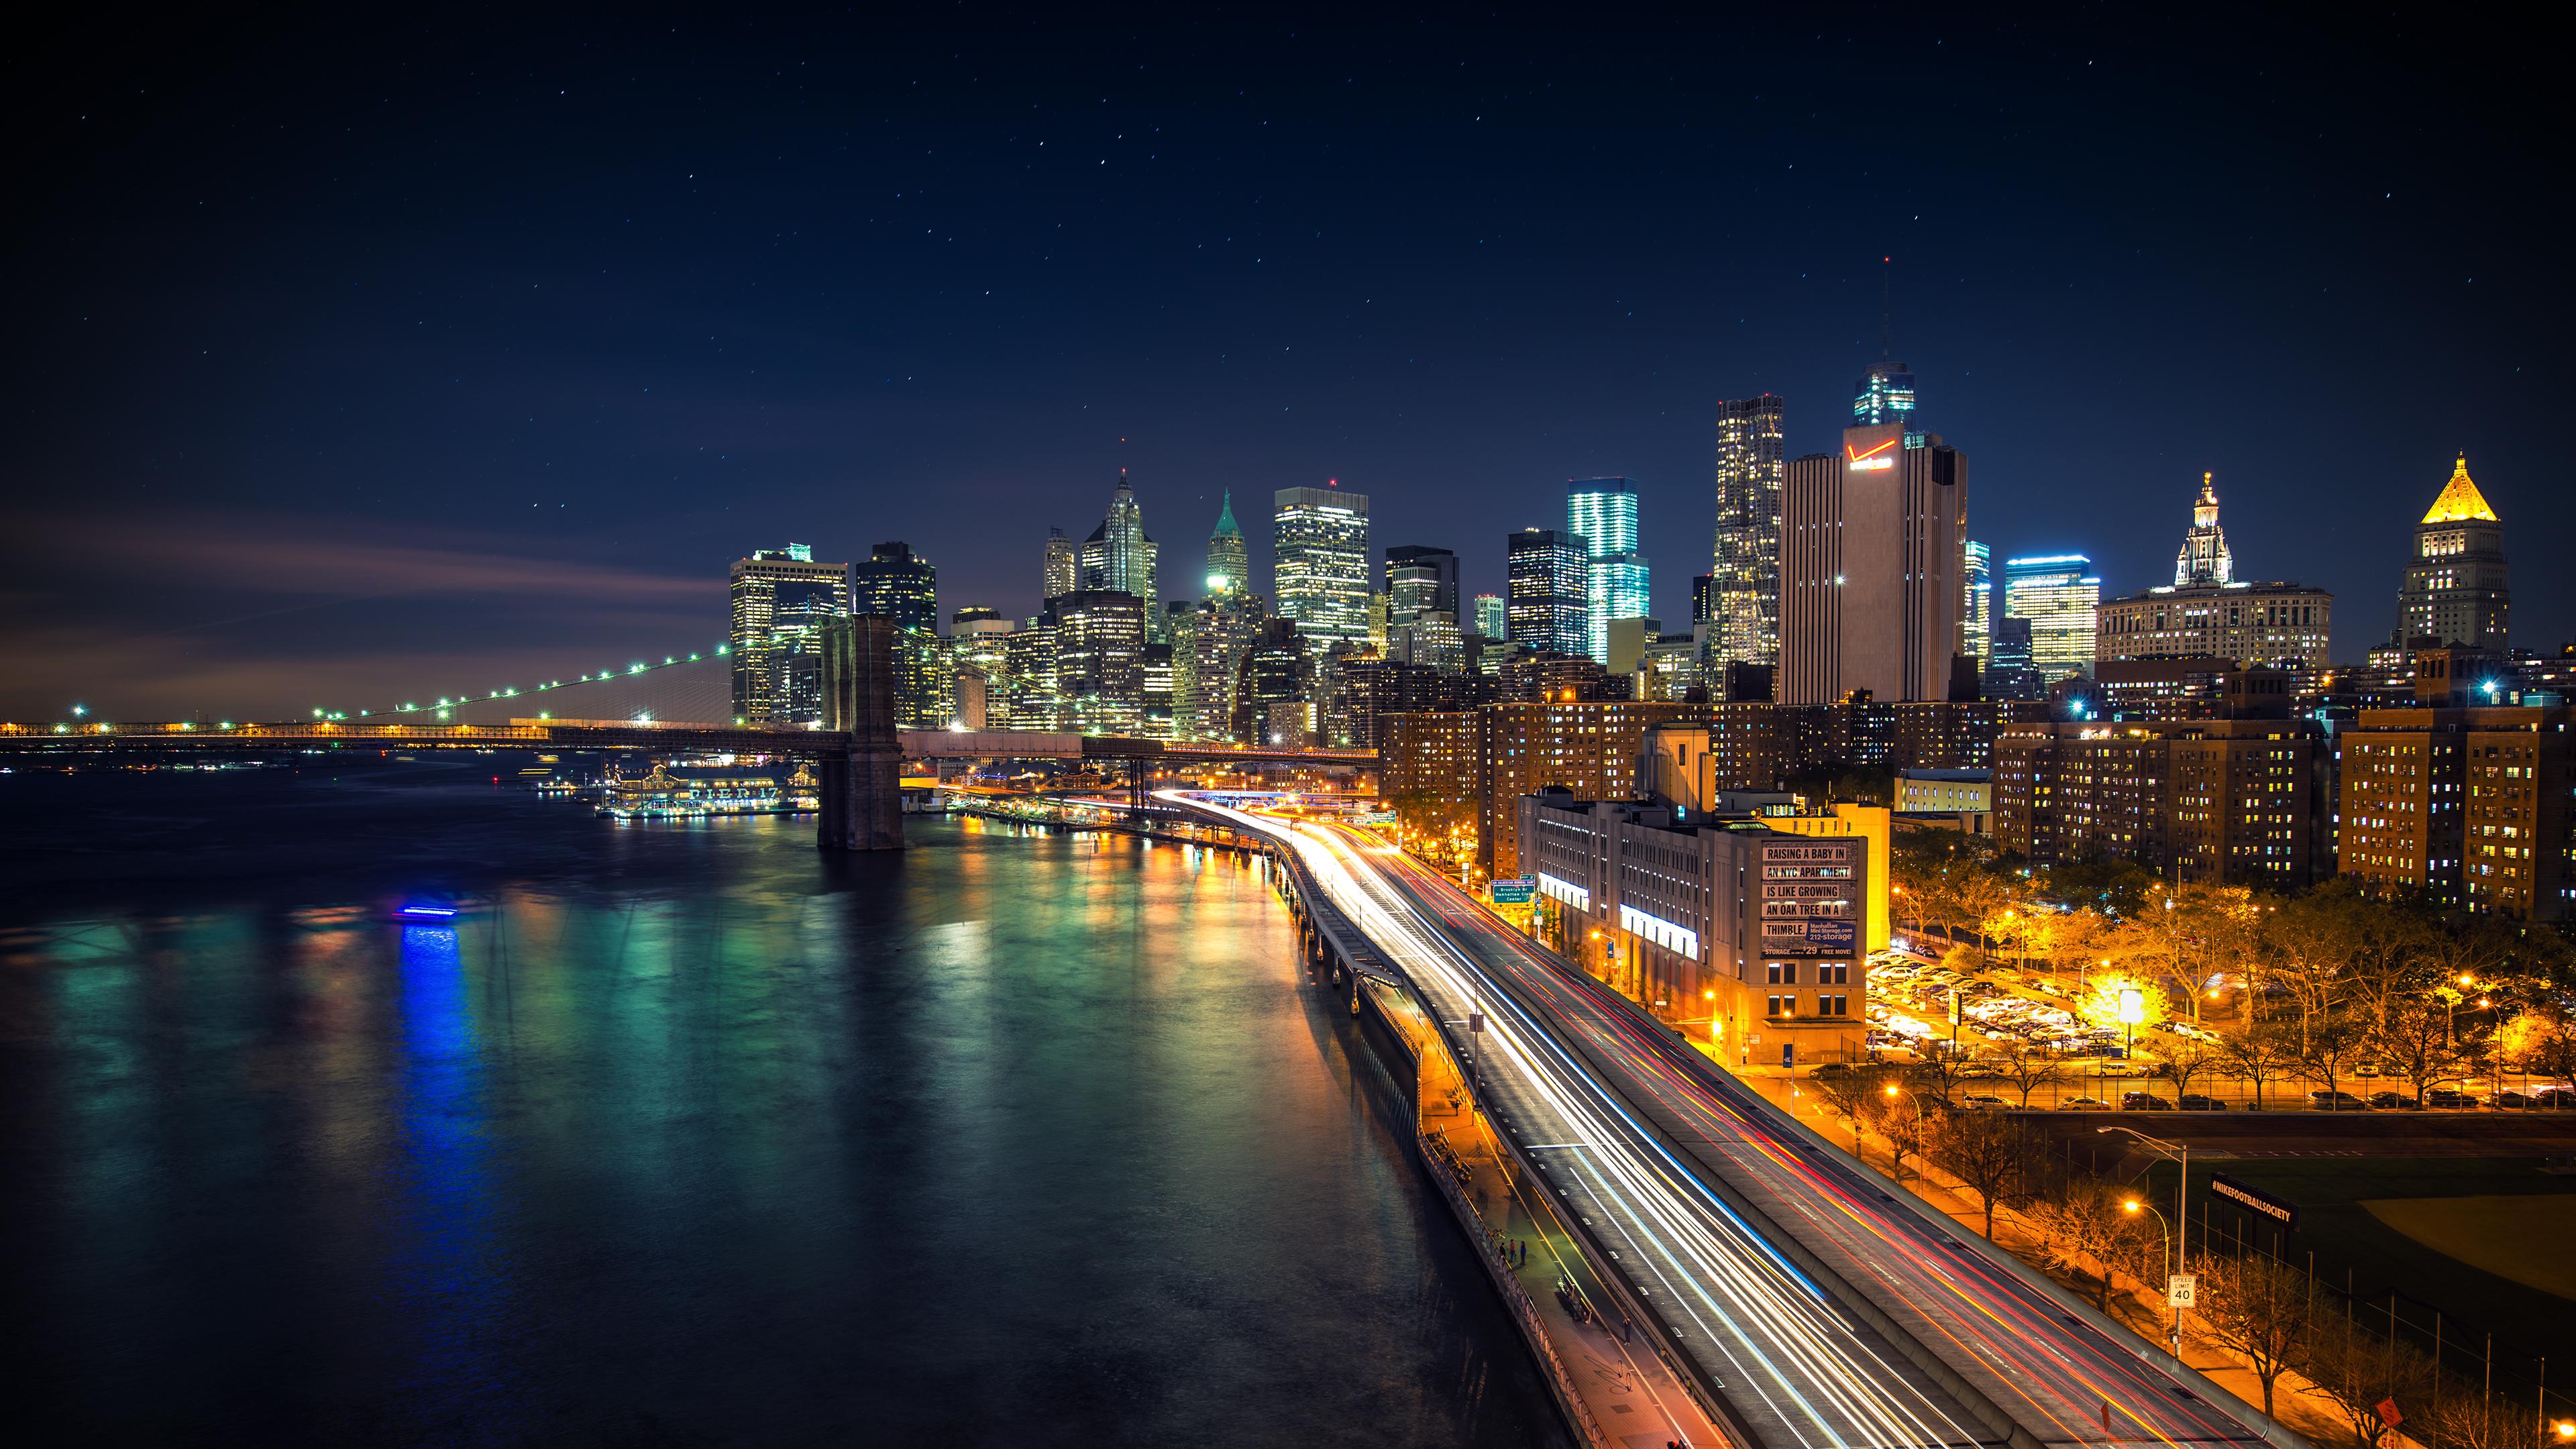 Free Download City Night Wallpaper 4k Desktop Backgrounds